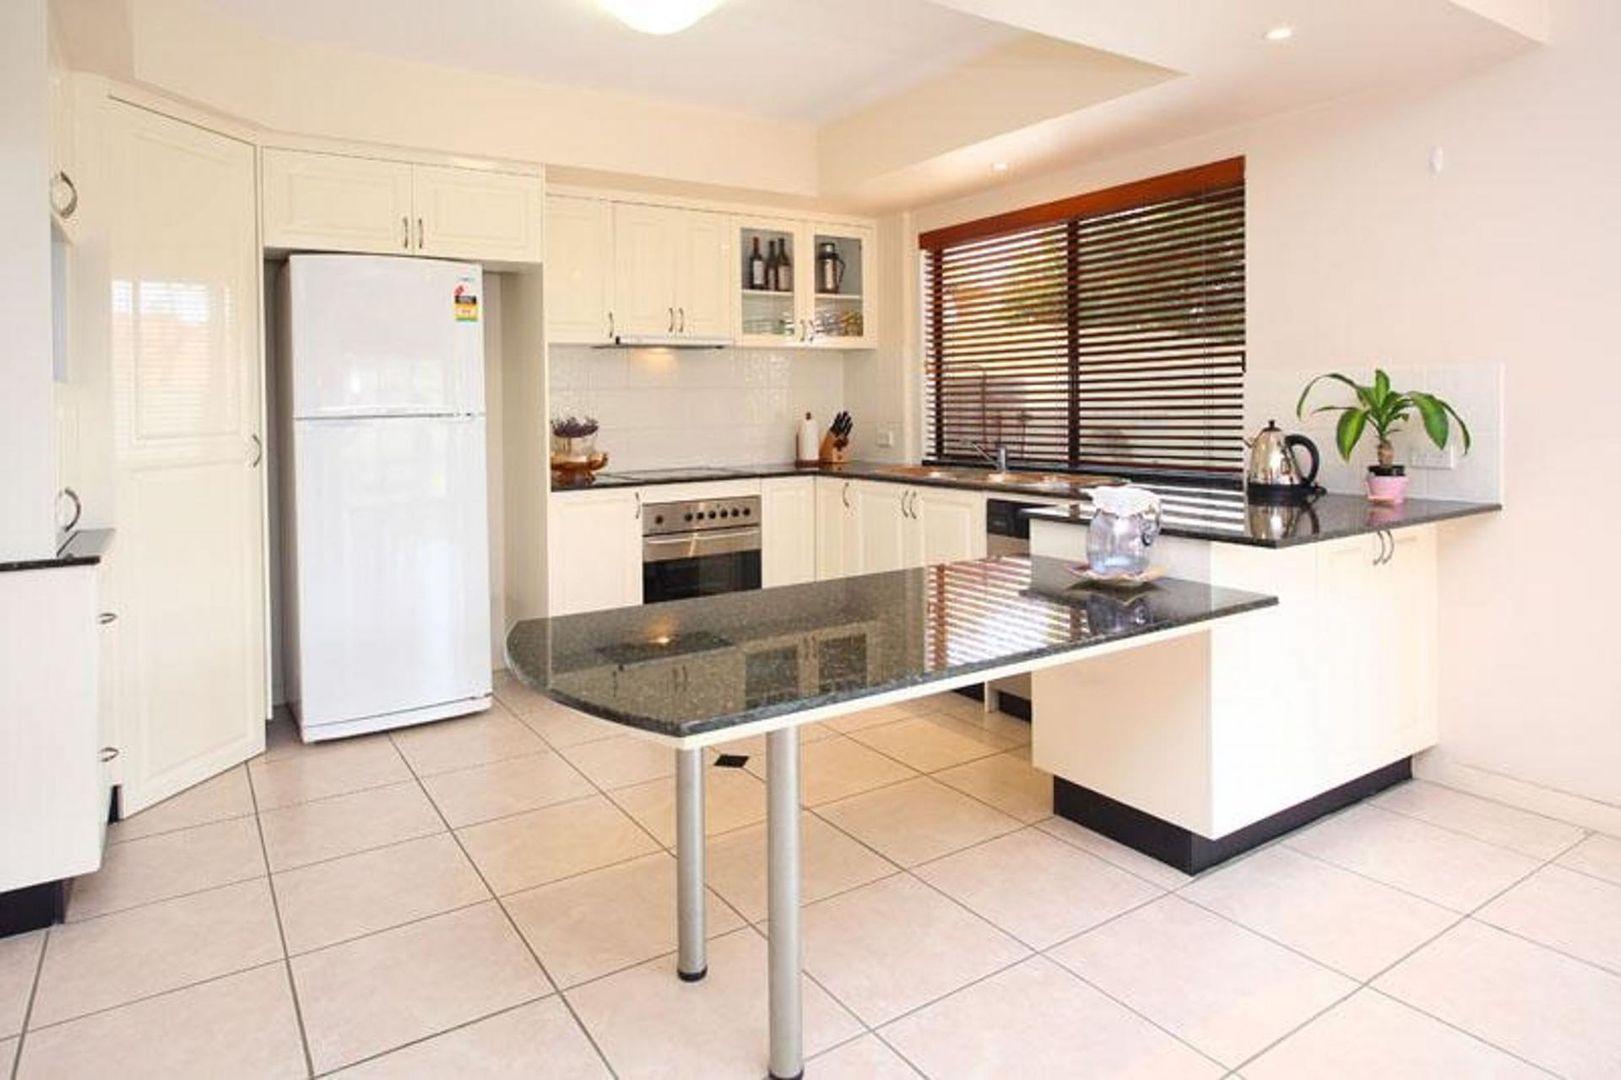 18/24 Radan St, Sunnybank Hills QLD 4109, Image 0